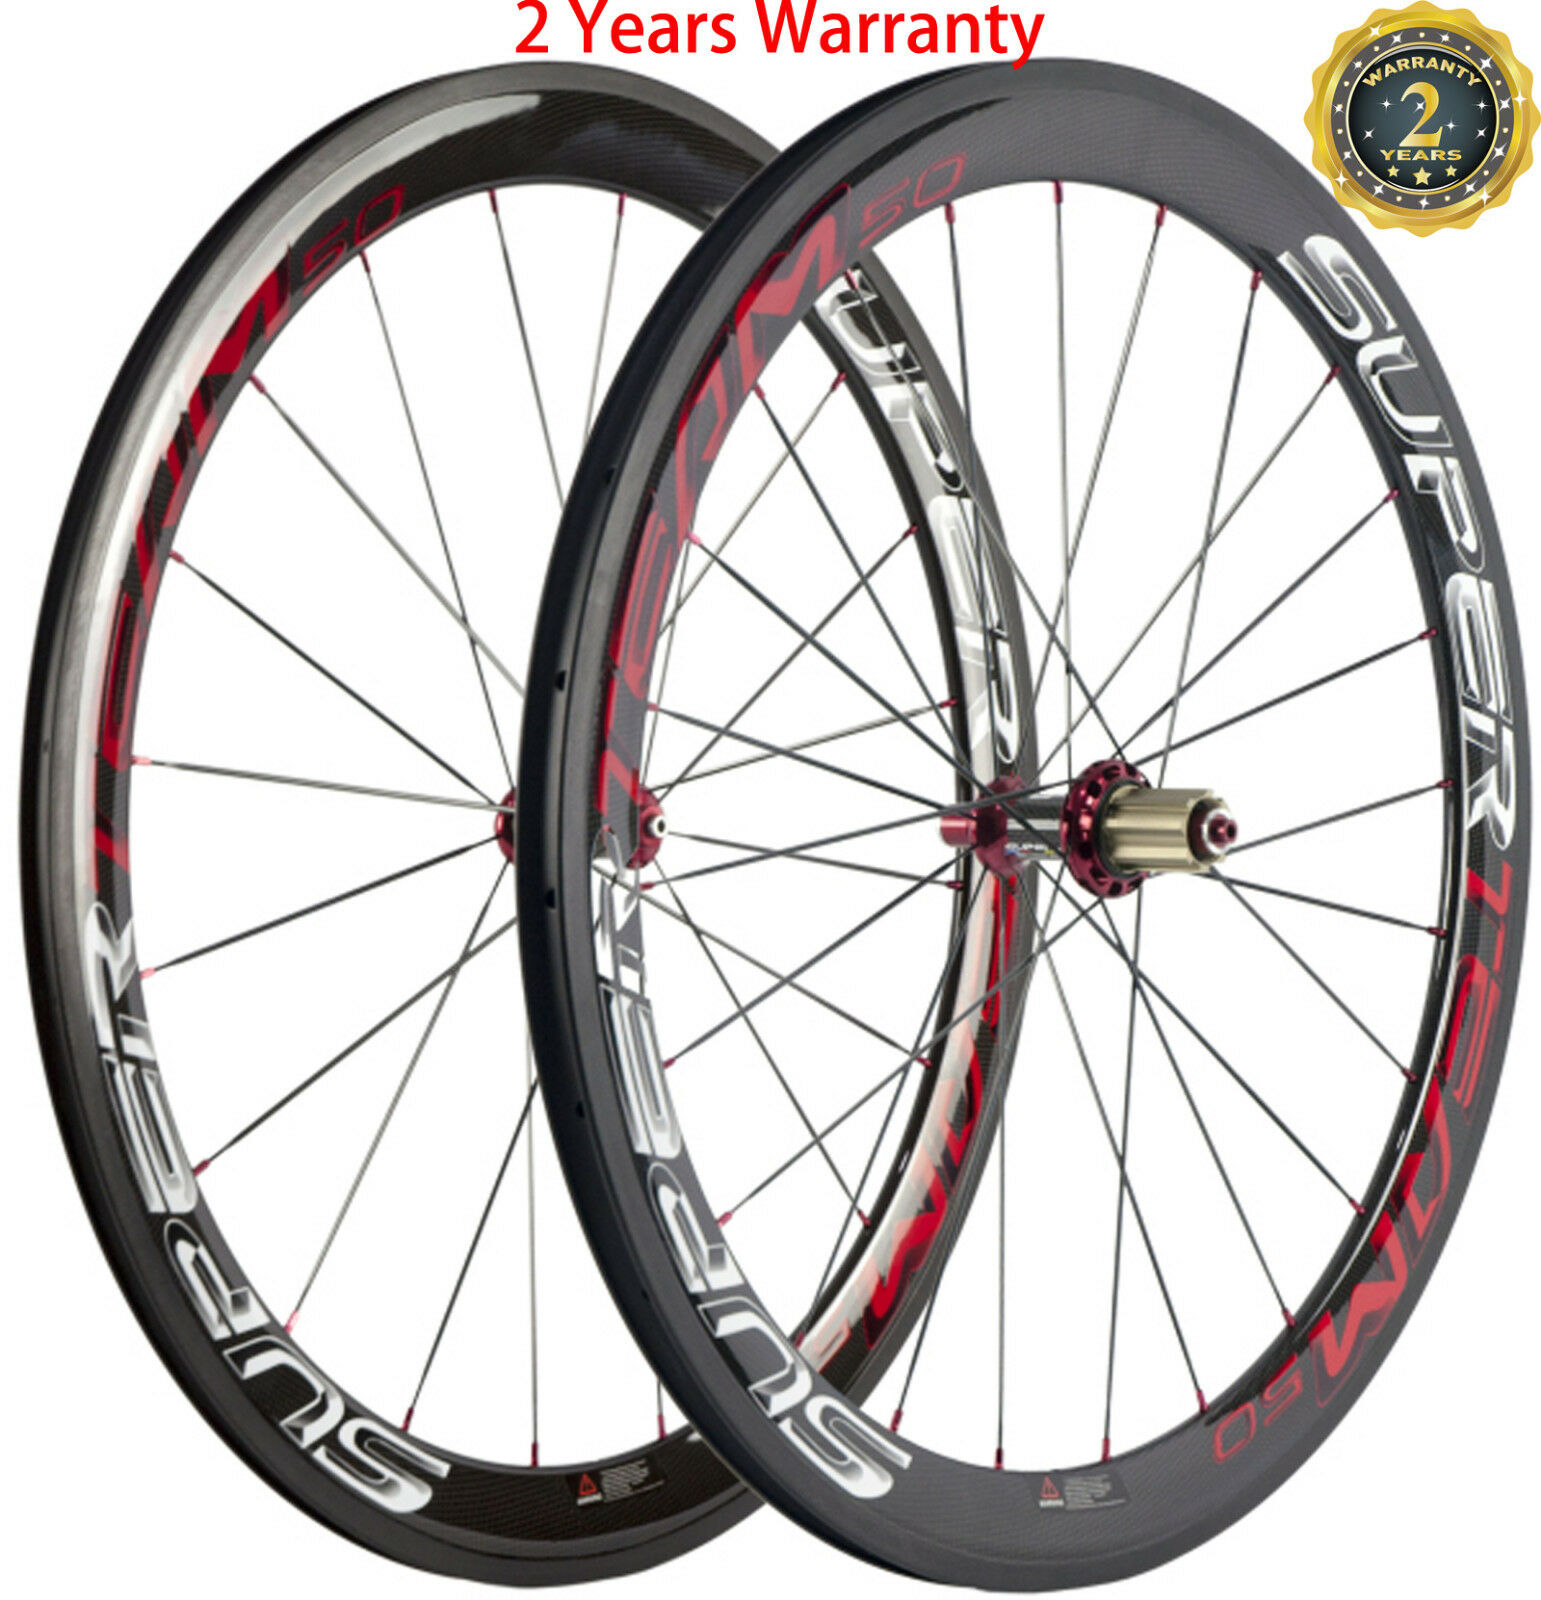 700C Bicycle Wheels 50mm Powerway R36 Hub Road Wheels Shimano  Campagnolo Bike  cost-effective